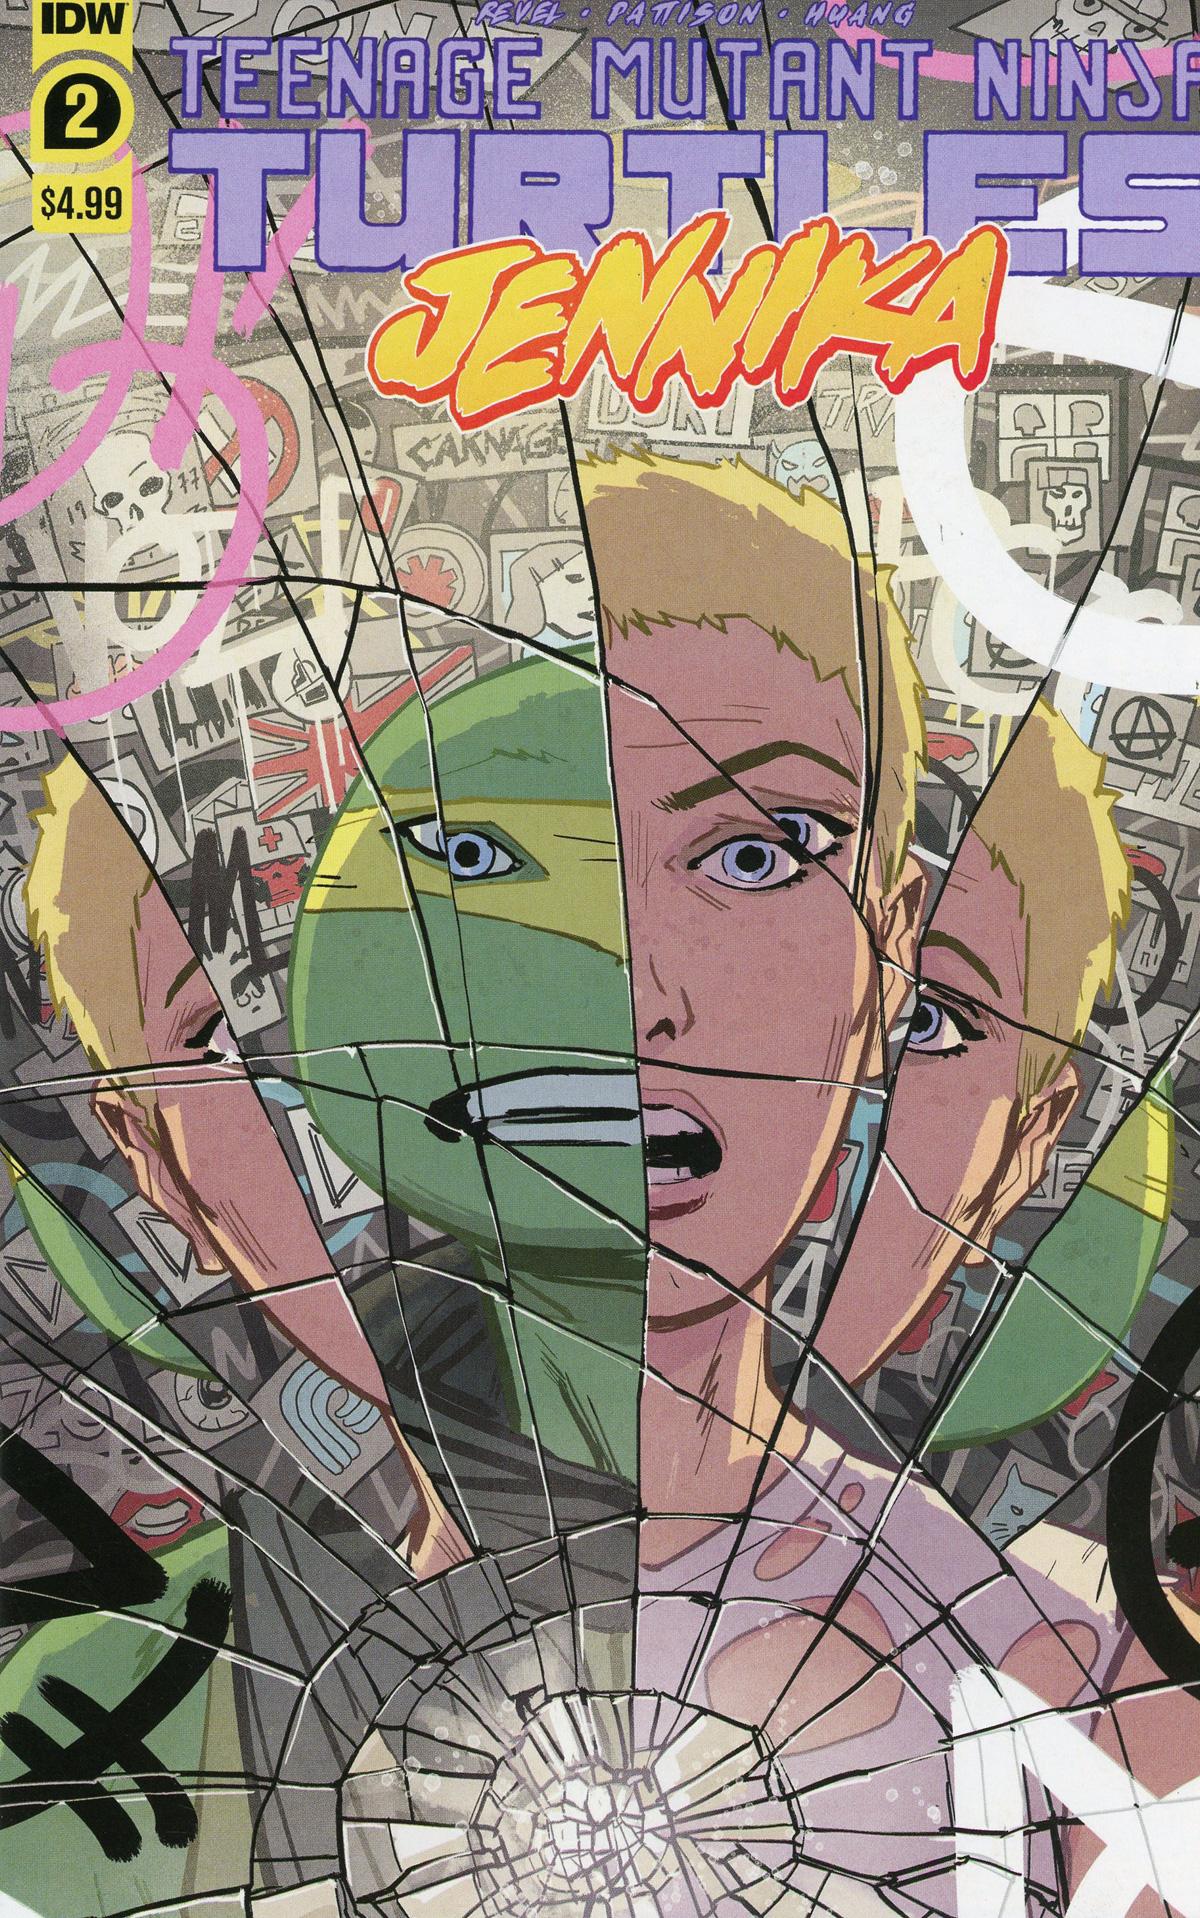 Teenage Mutant Ninja Turtles Jennika #2 Cover A Regular Brahm Revel Cover